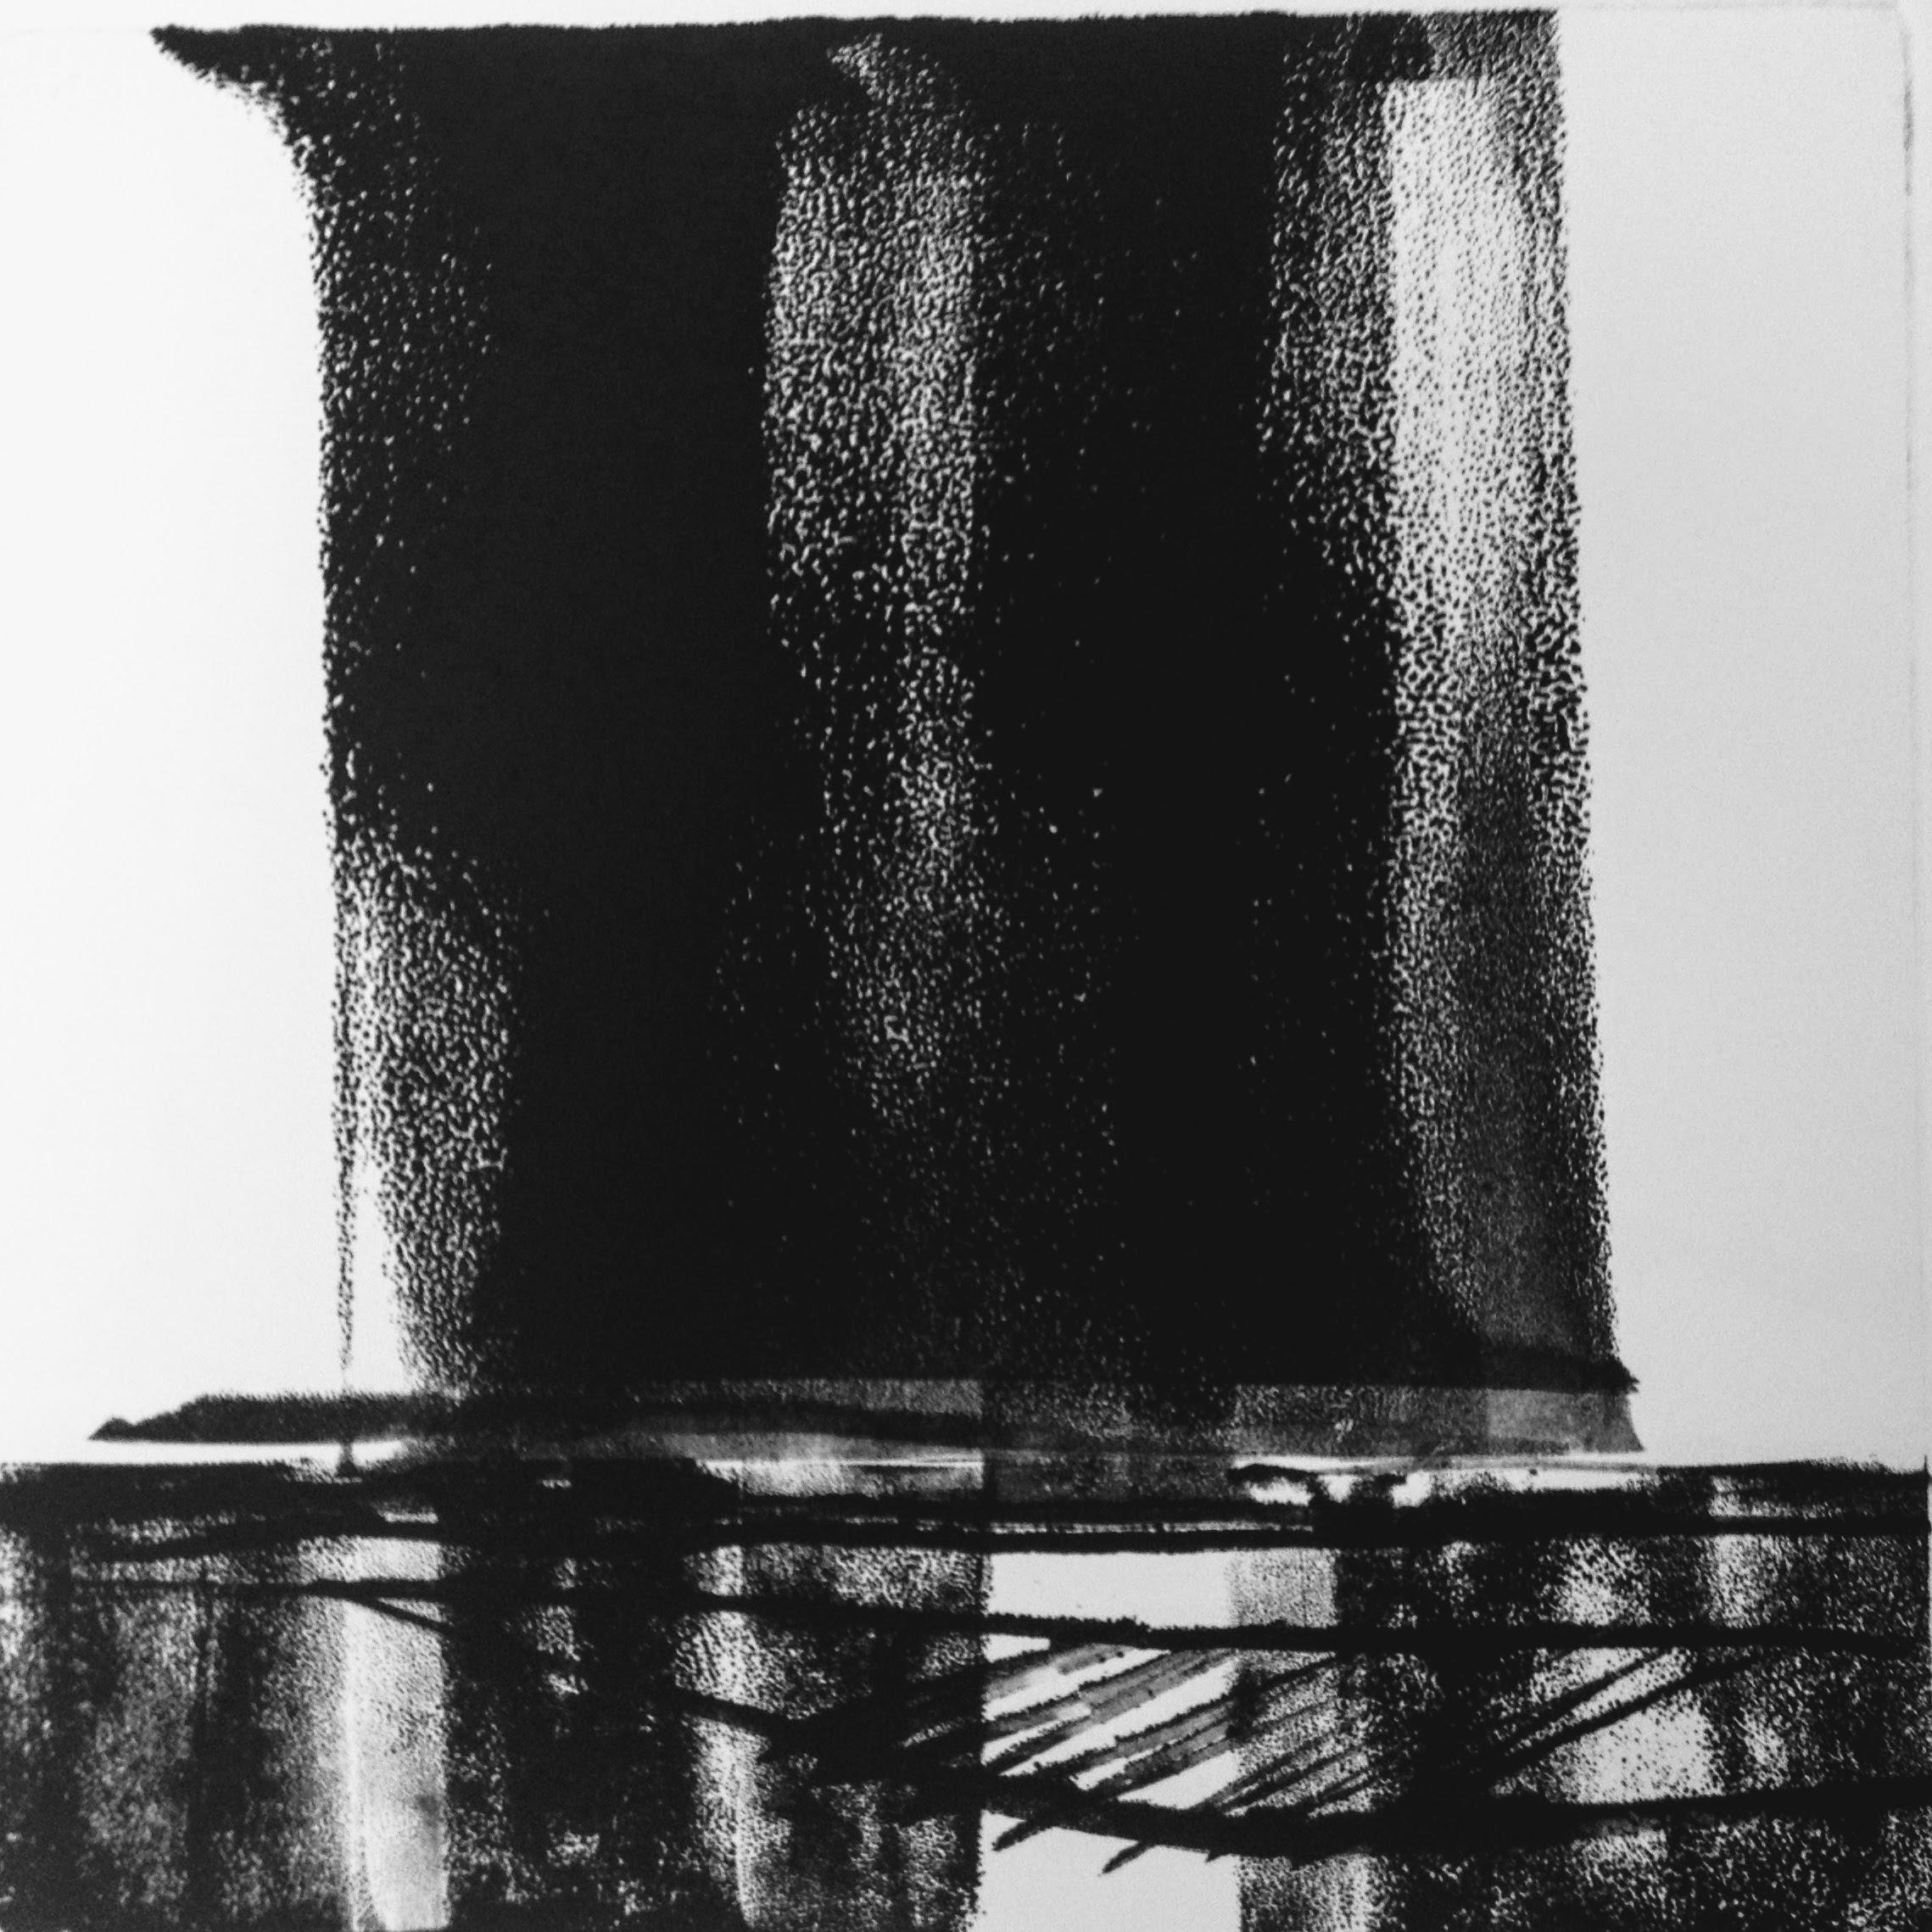 Dark Skies III, monotype, 2017, 300x300mm, 250gm Somerset Satin